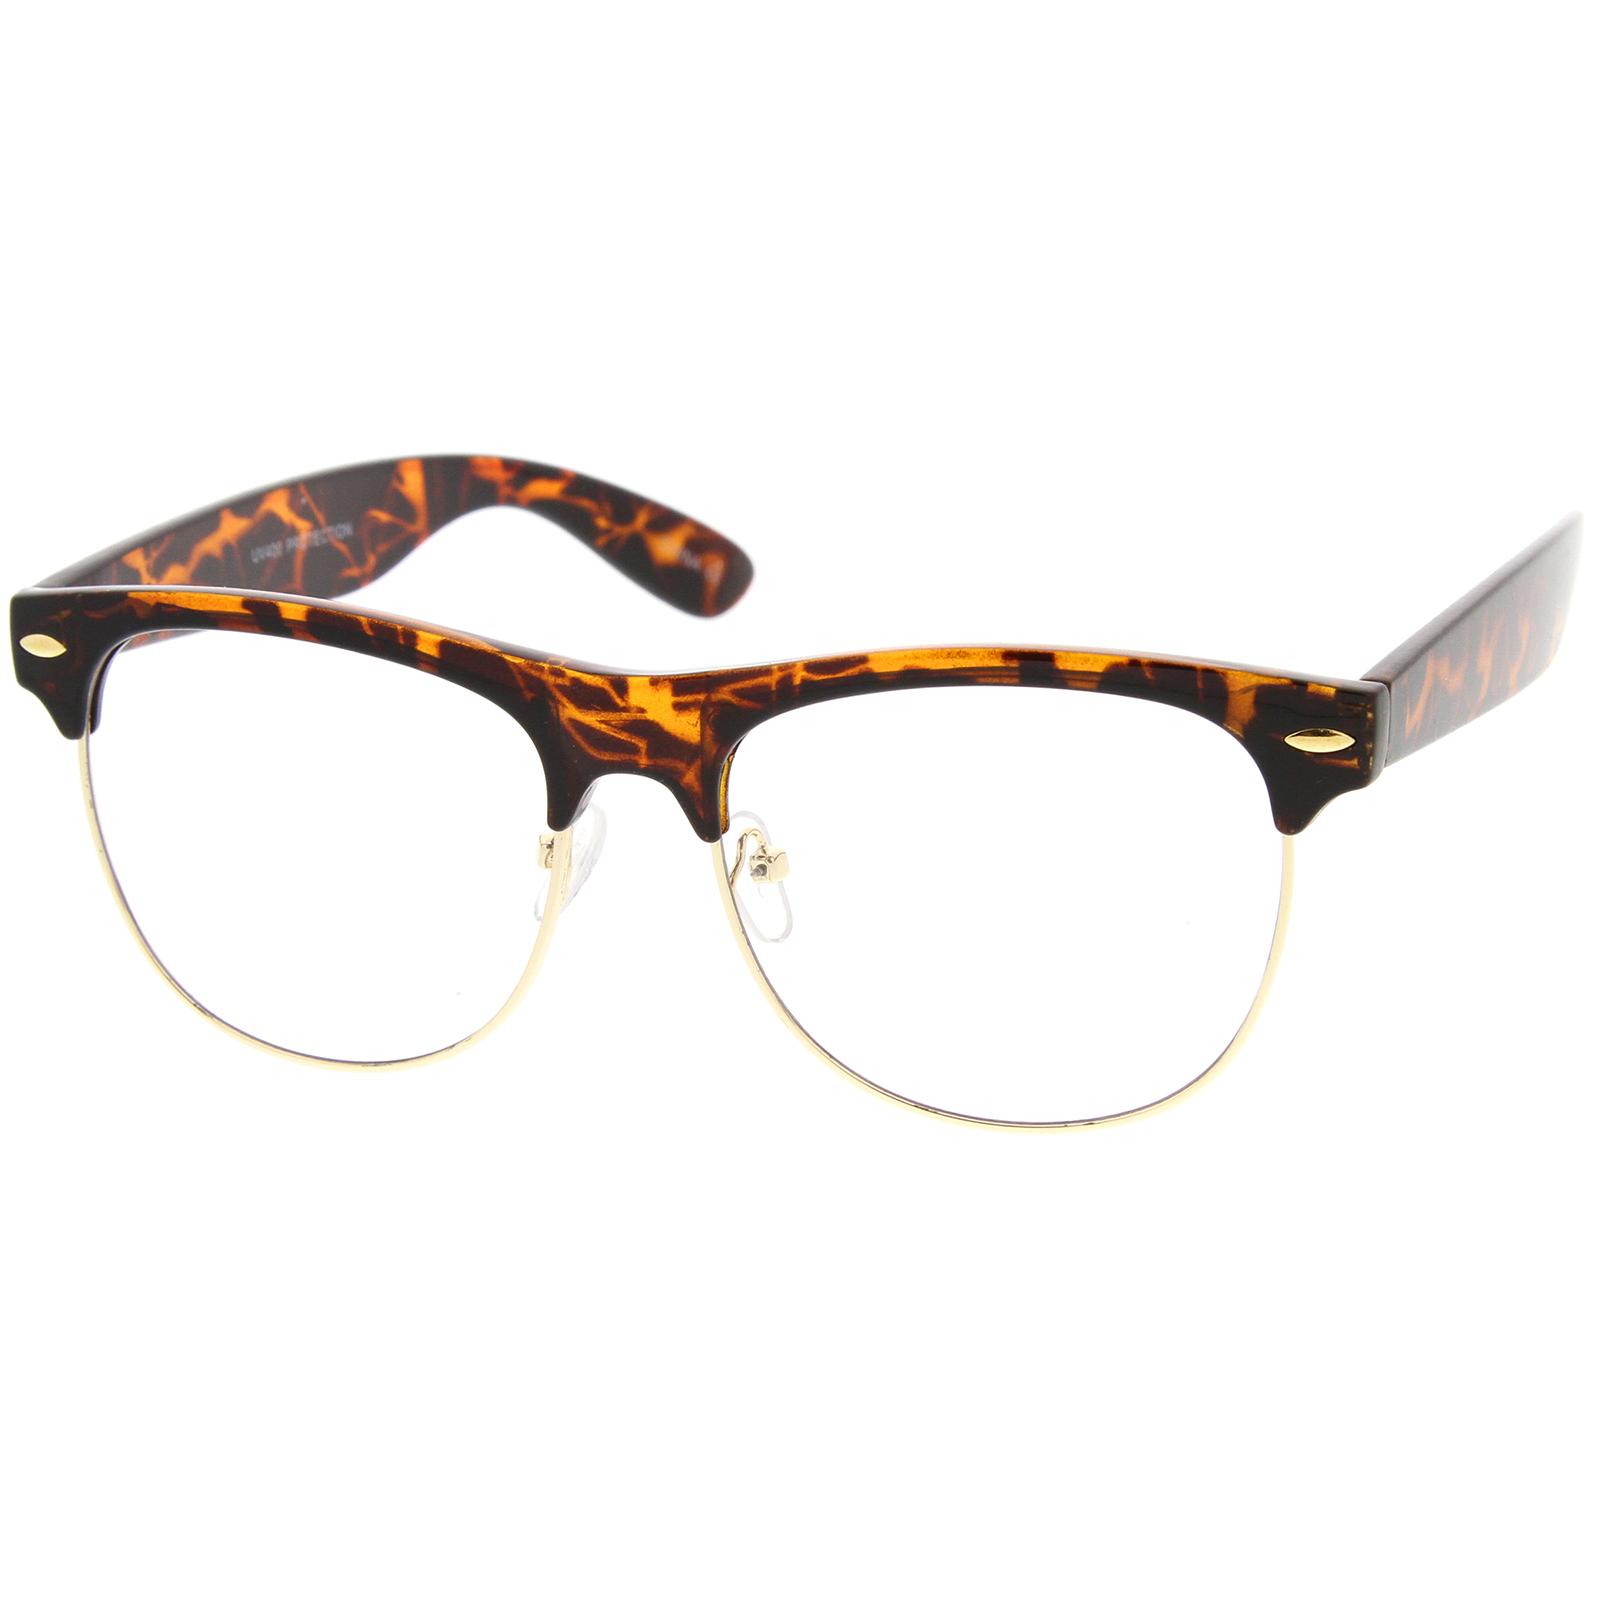 Half Frame Horn Rimmed Glasses : sunglassLA Classic Horn Rimmed Clear Lens Half Frame Glasses